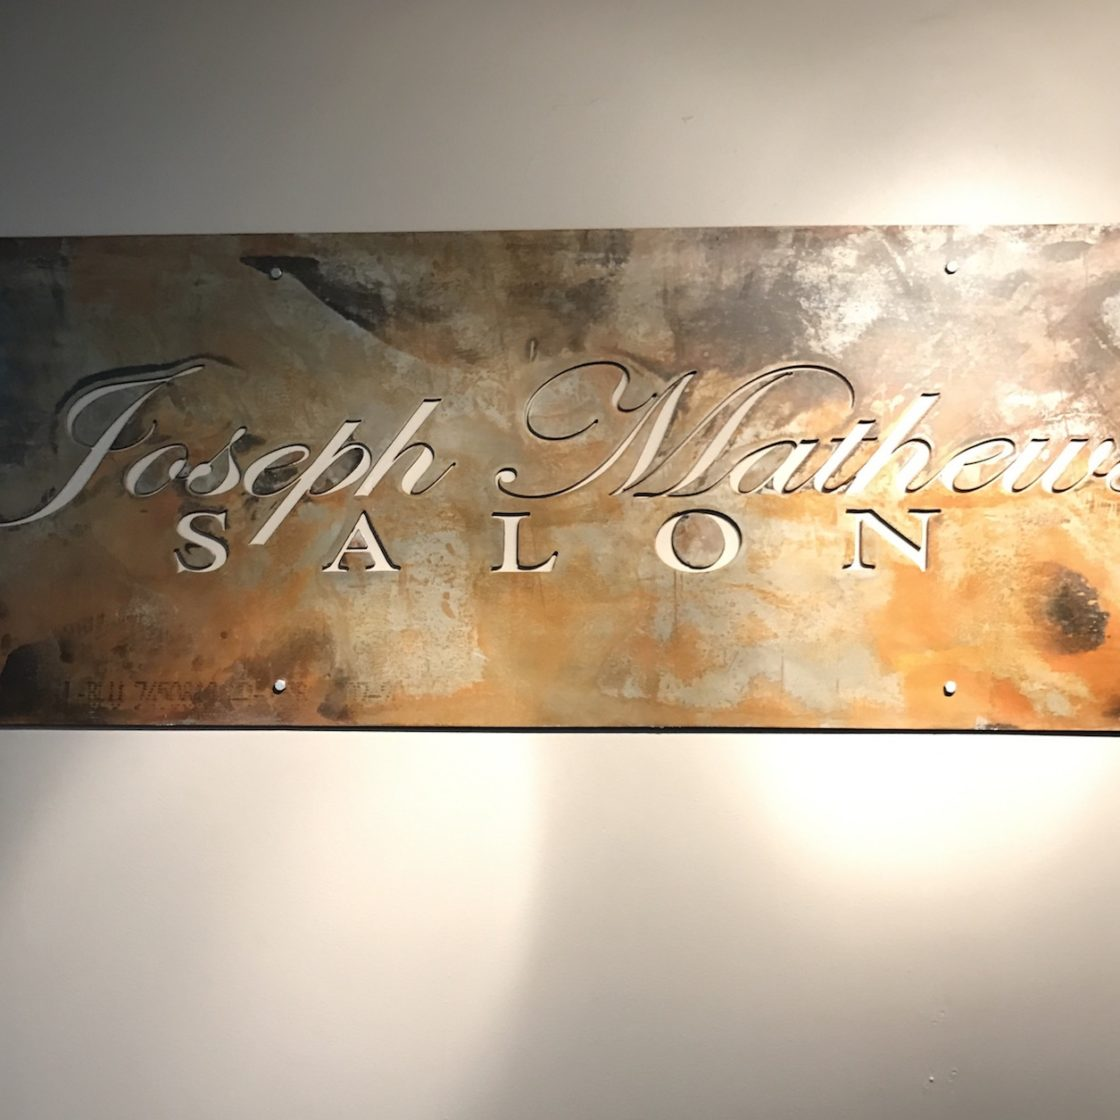 Joseph Matthews Salon Plasma Cut Steel Reception Sign